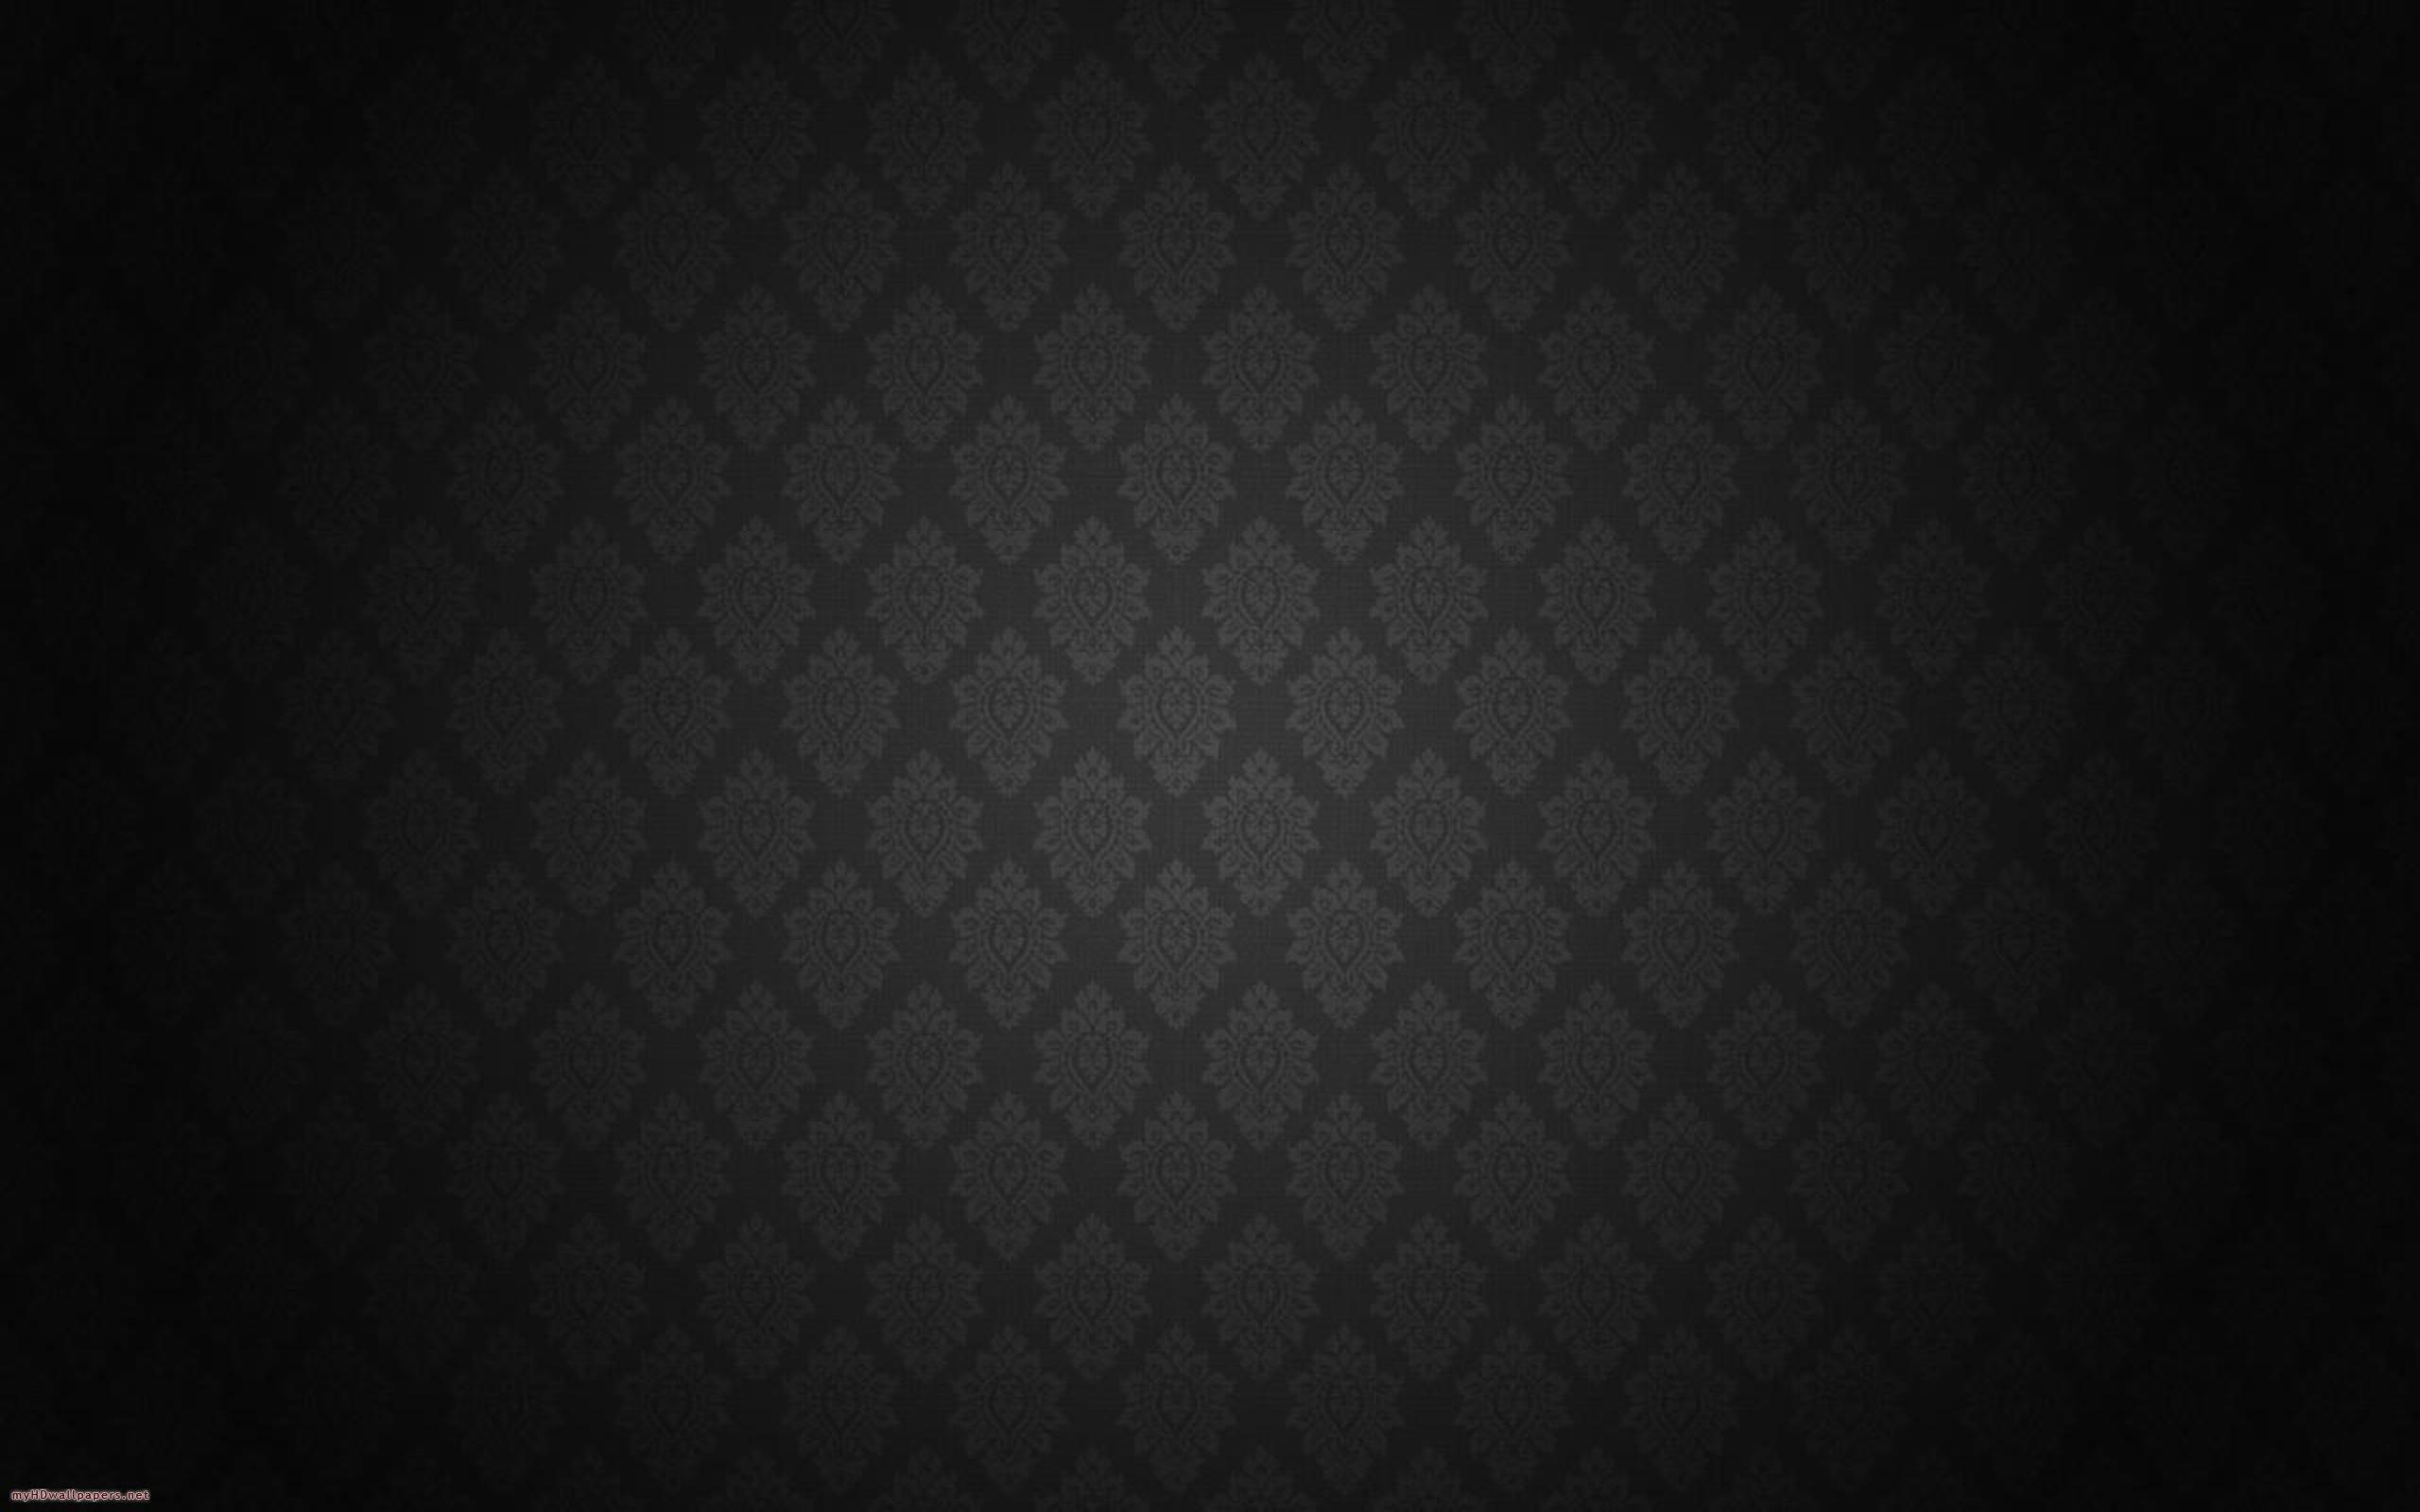 Golden Black Wallpaper Posted By Ryan Mercado